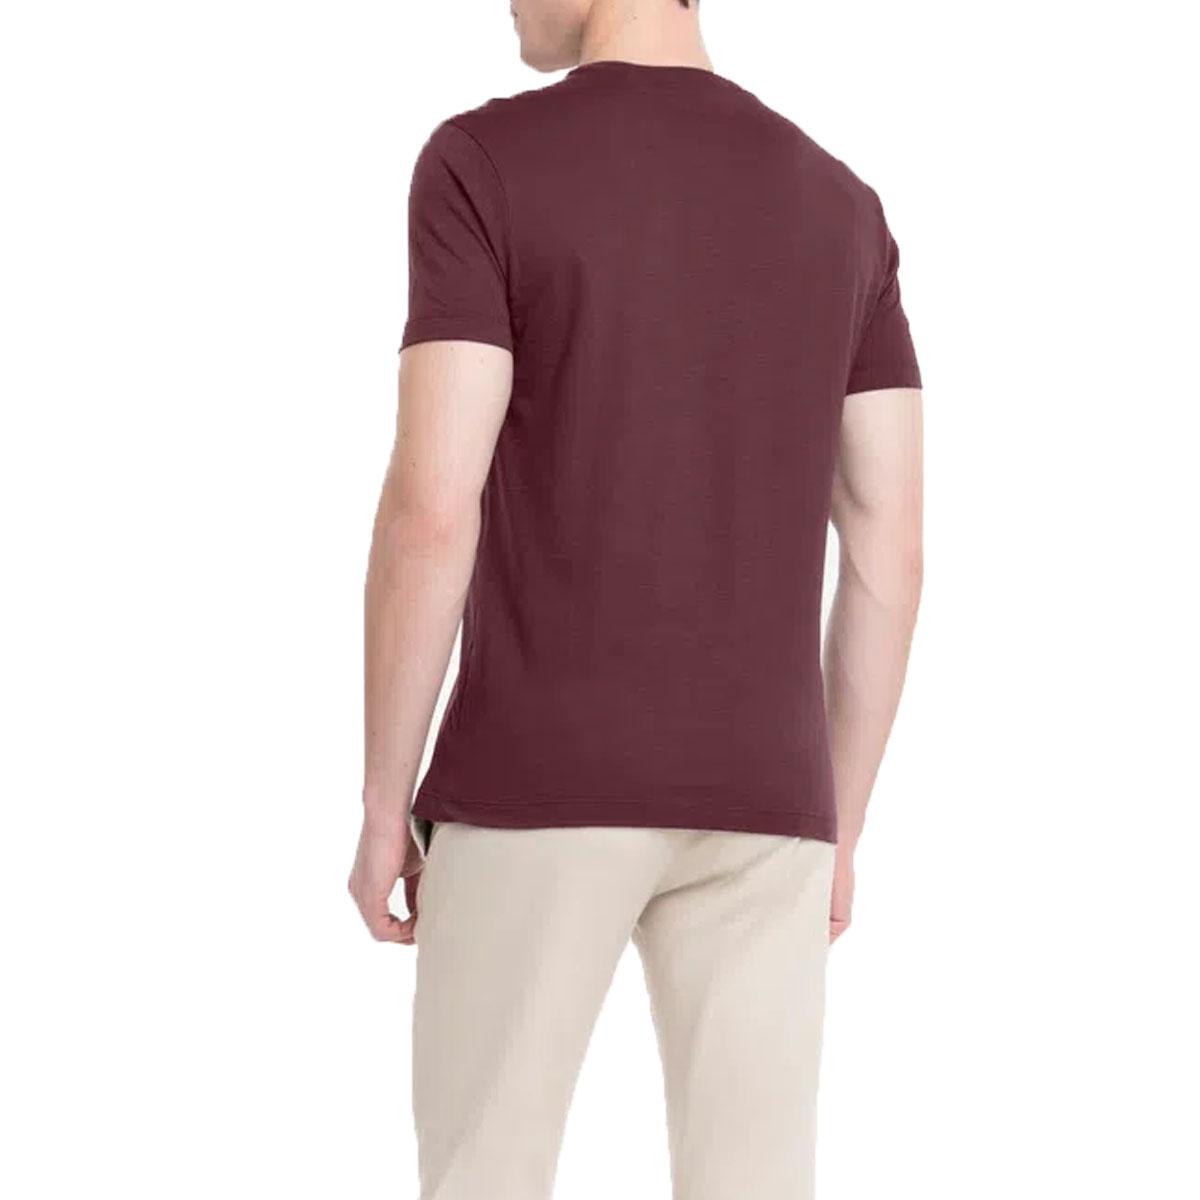 Camiseta Calvin Klein Masculina Flame Bordo